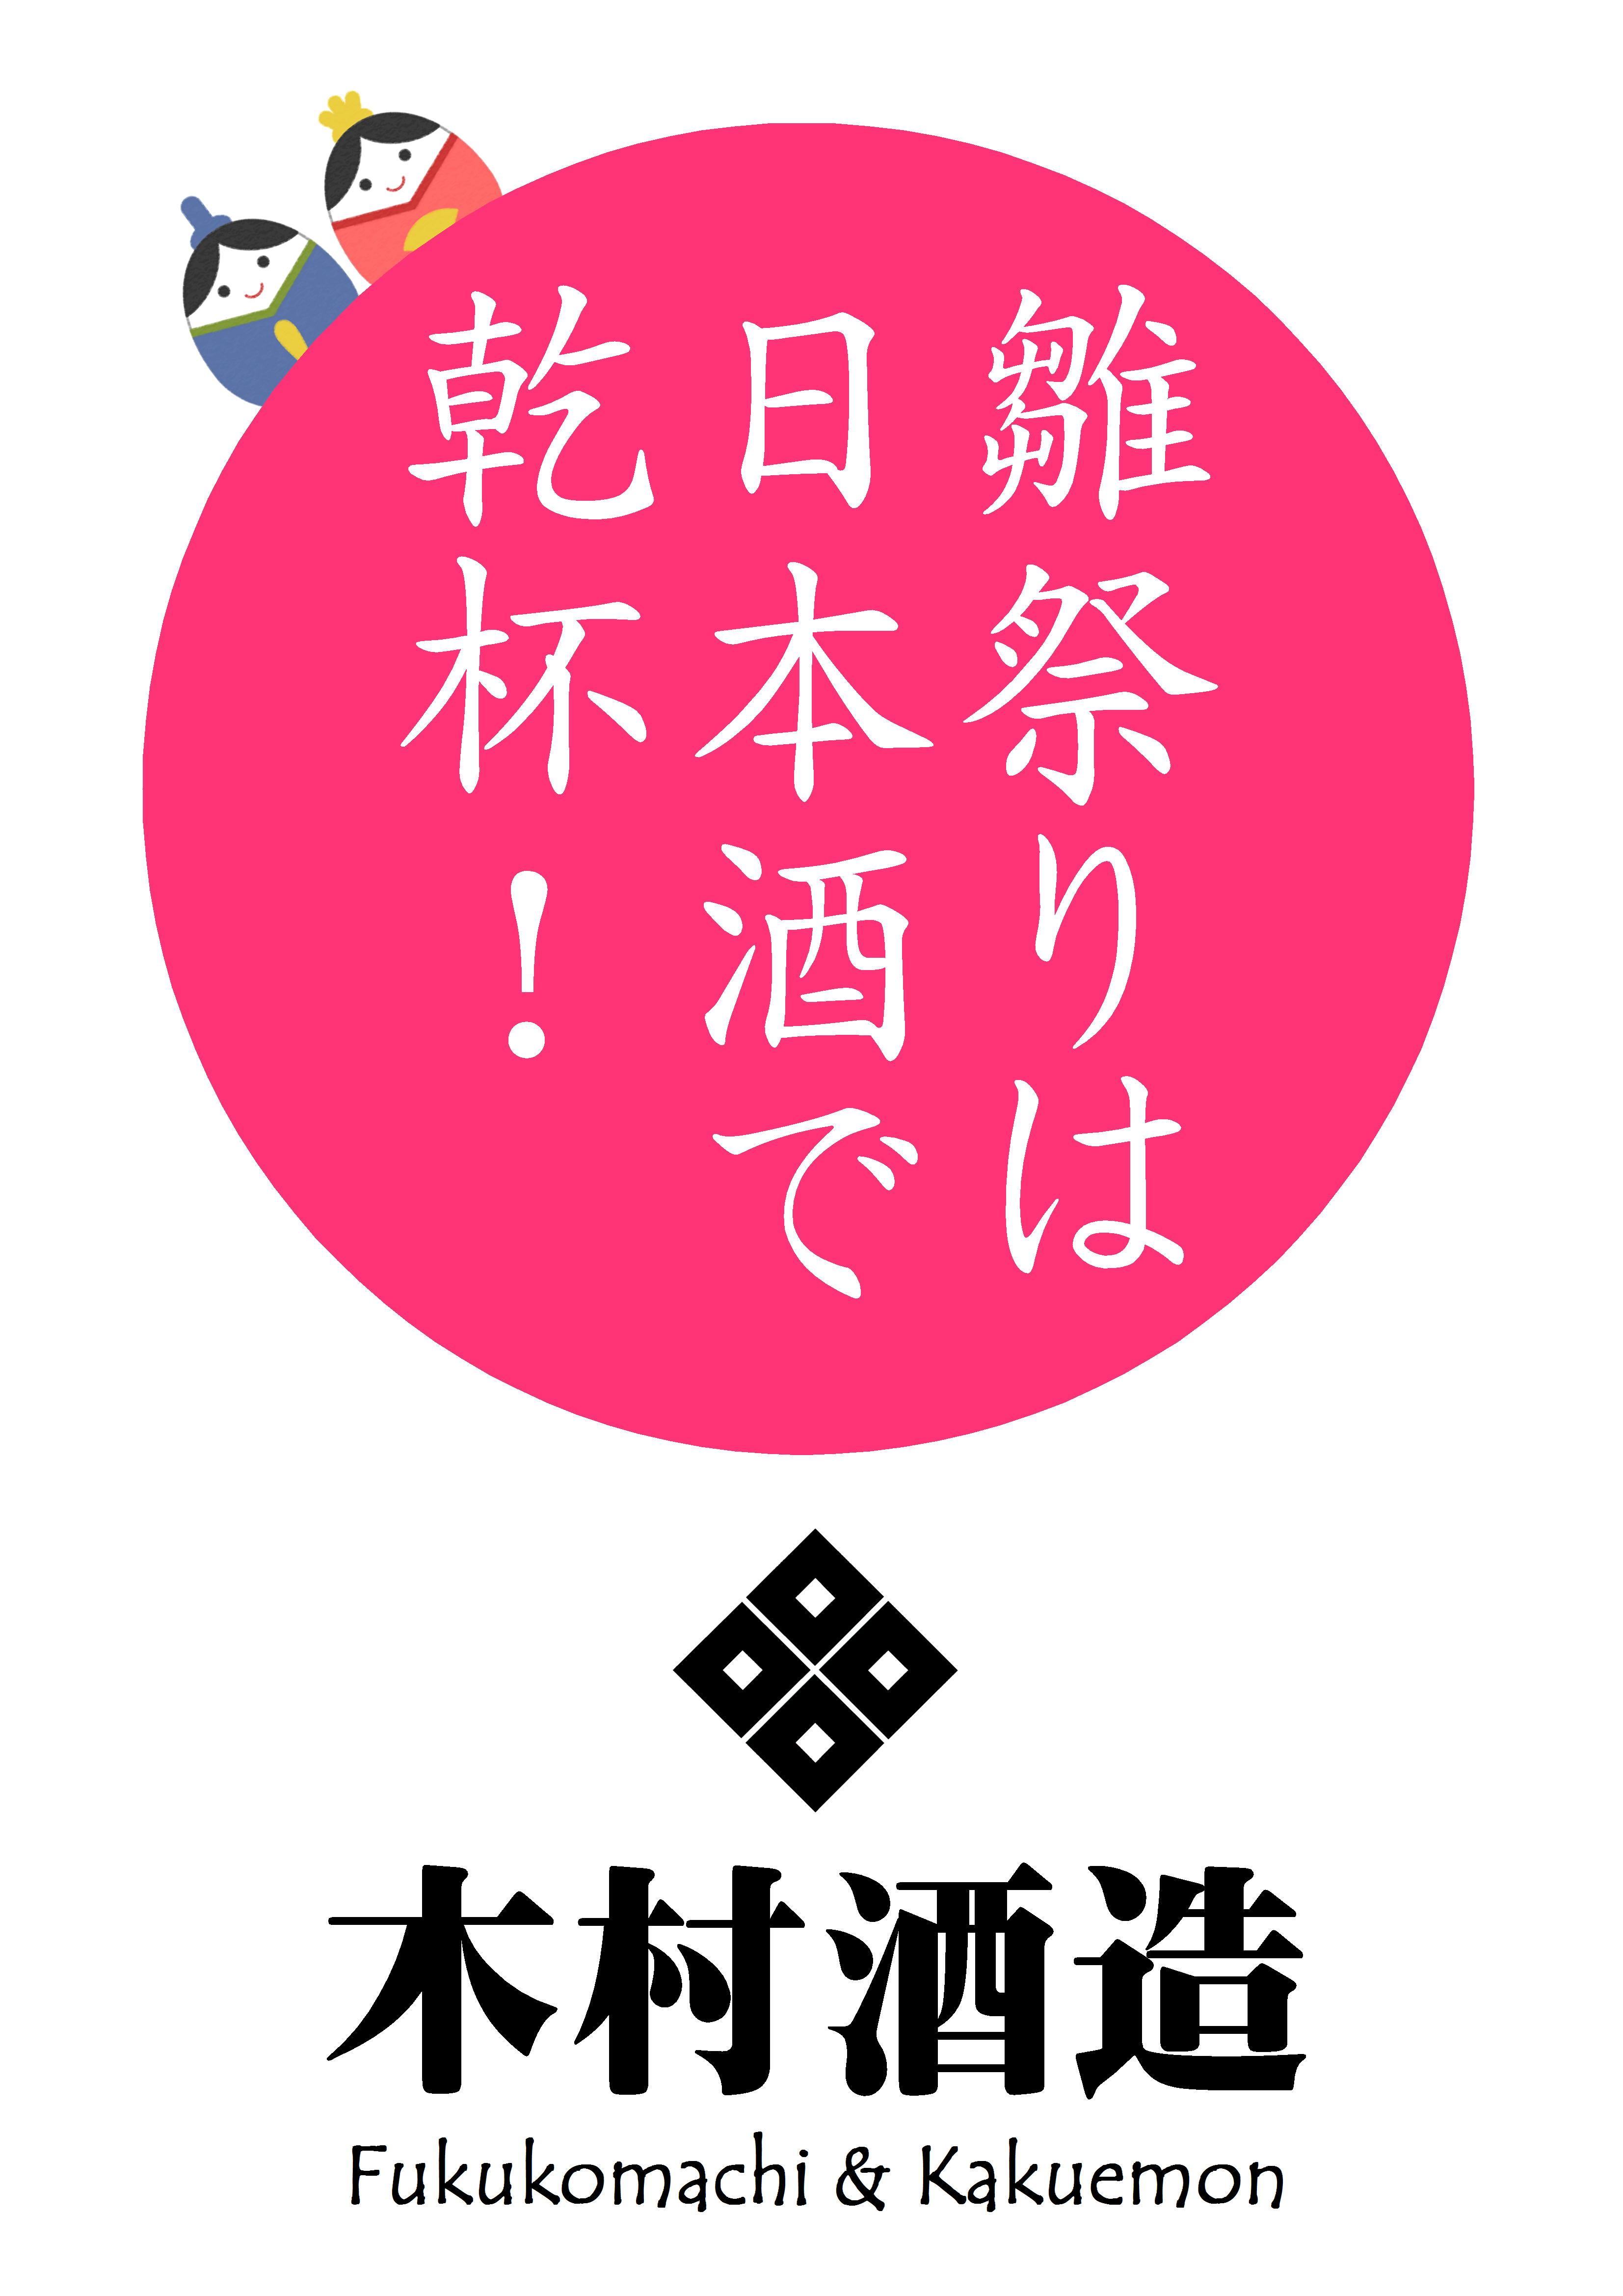 http://www.fukukomachi.com/blog/photo/20170303.JPG